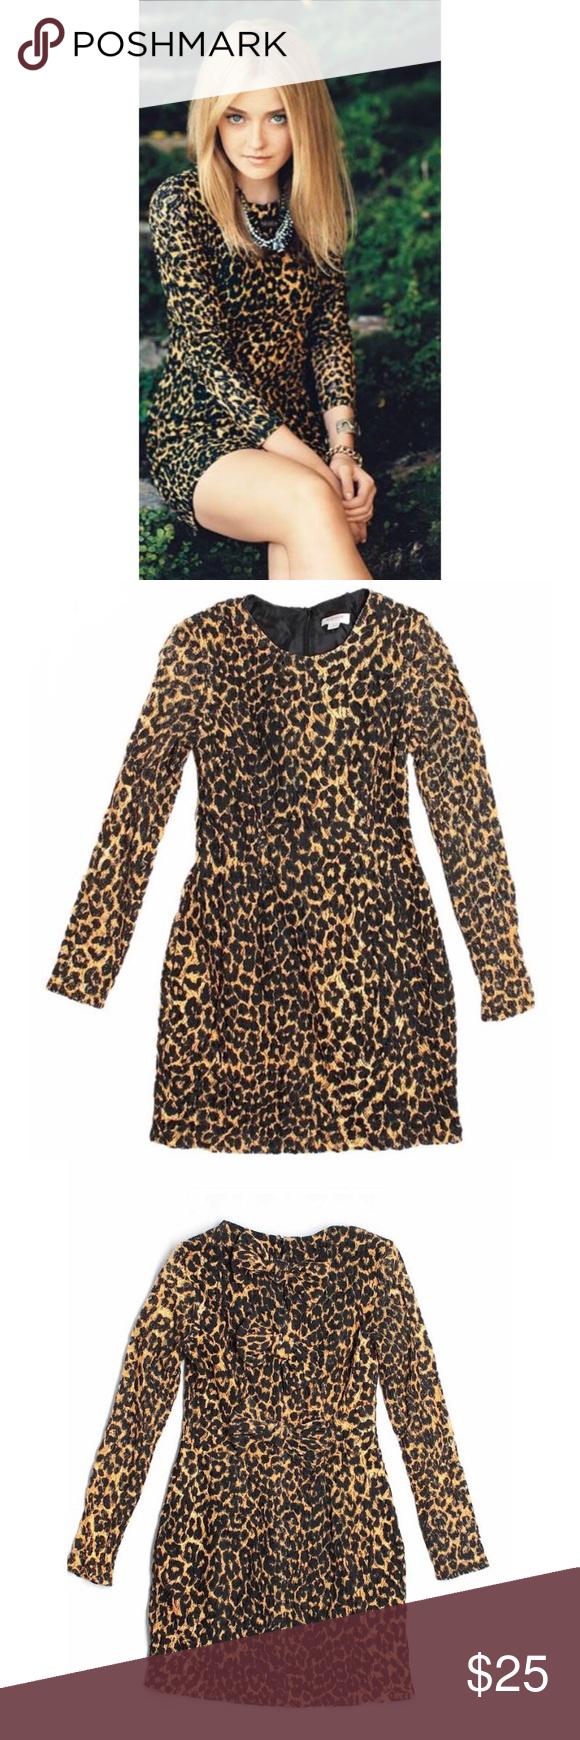 Rodarte For Target Leopard Print Long Sleeve Dress Rodarte For Target Leopard Print Long Sleev Long Sleeve Print Dress Long Sleeve Dress Long Sleeve Lace Dress [ 1740 x 580 Pixel ]